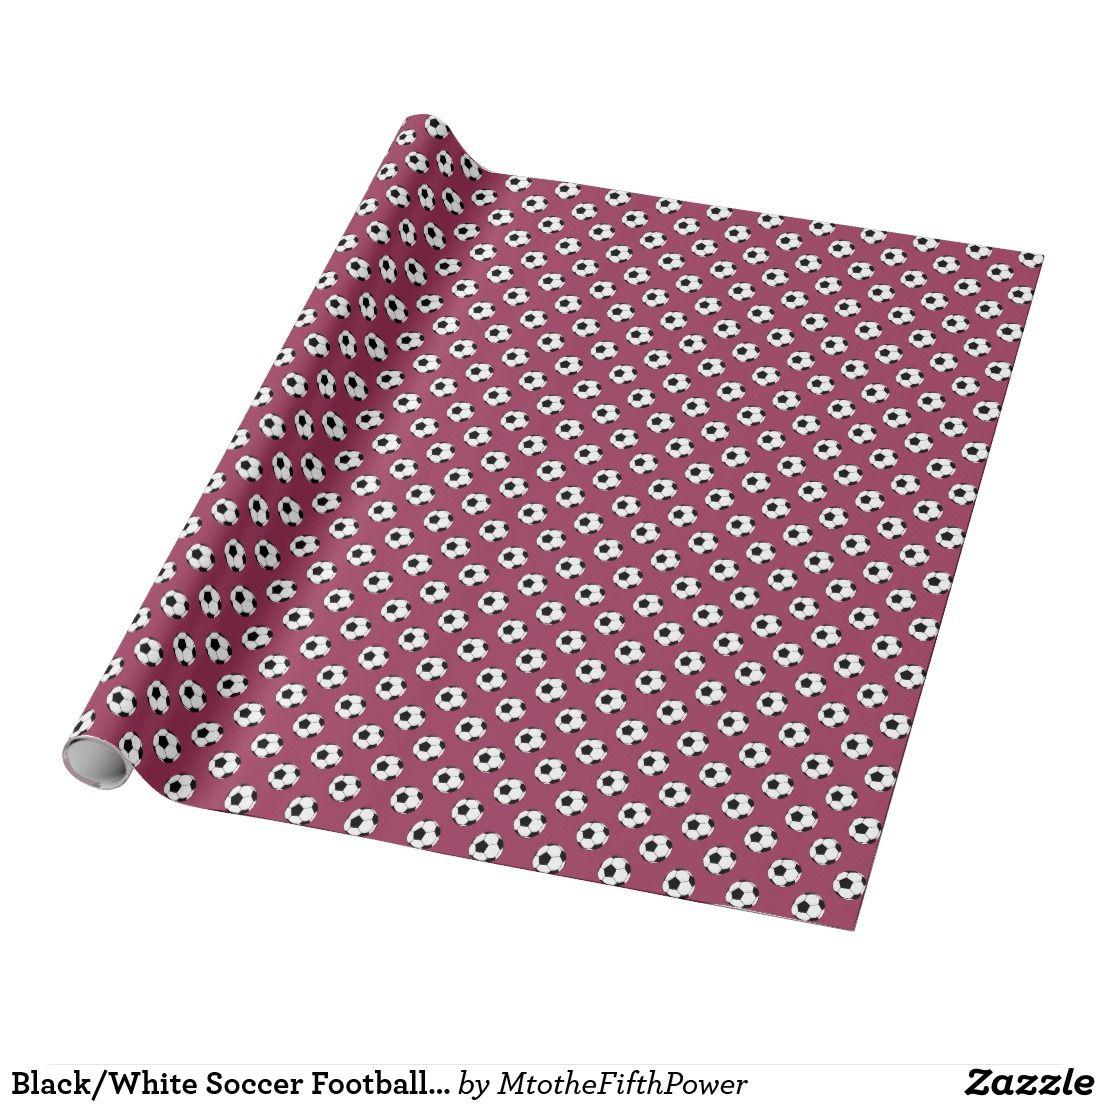 black white soccer football balls on sangria pink wrapping paper rh pinterest com